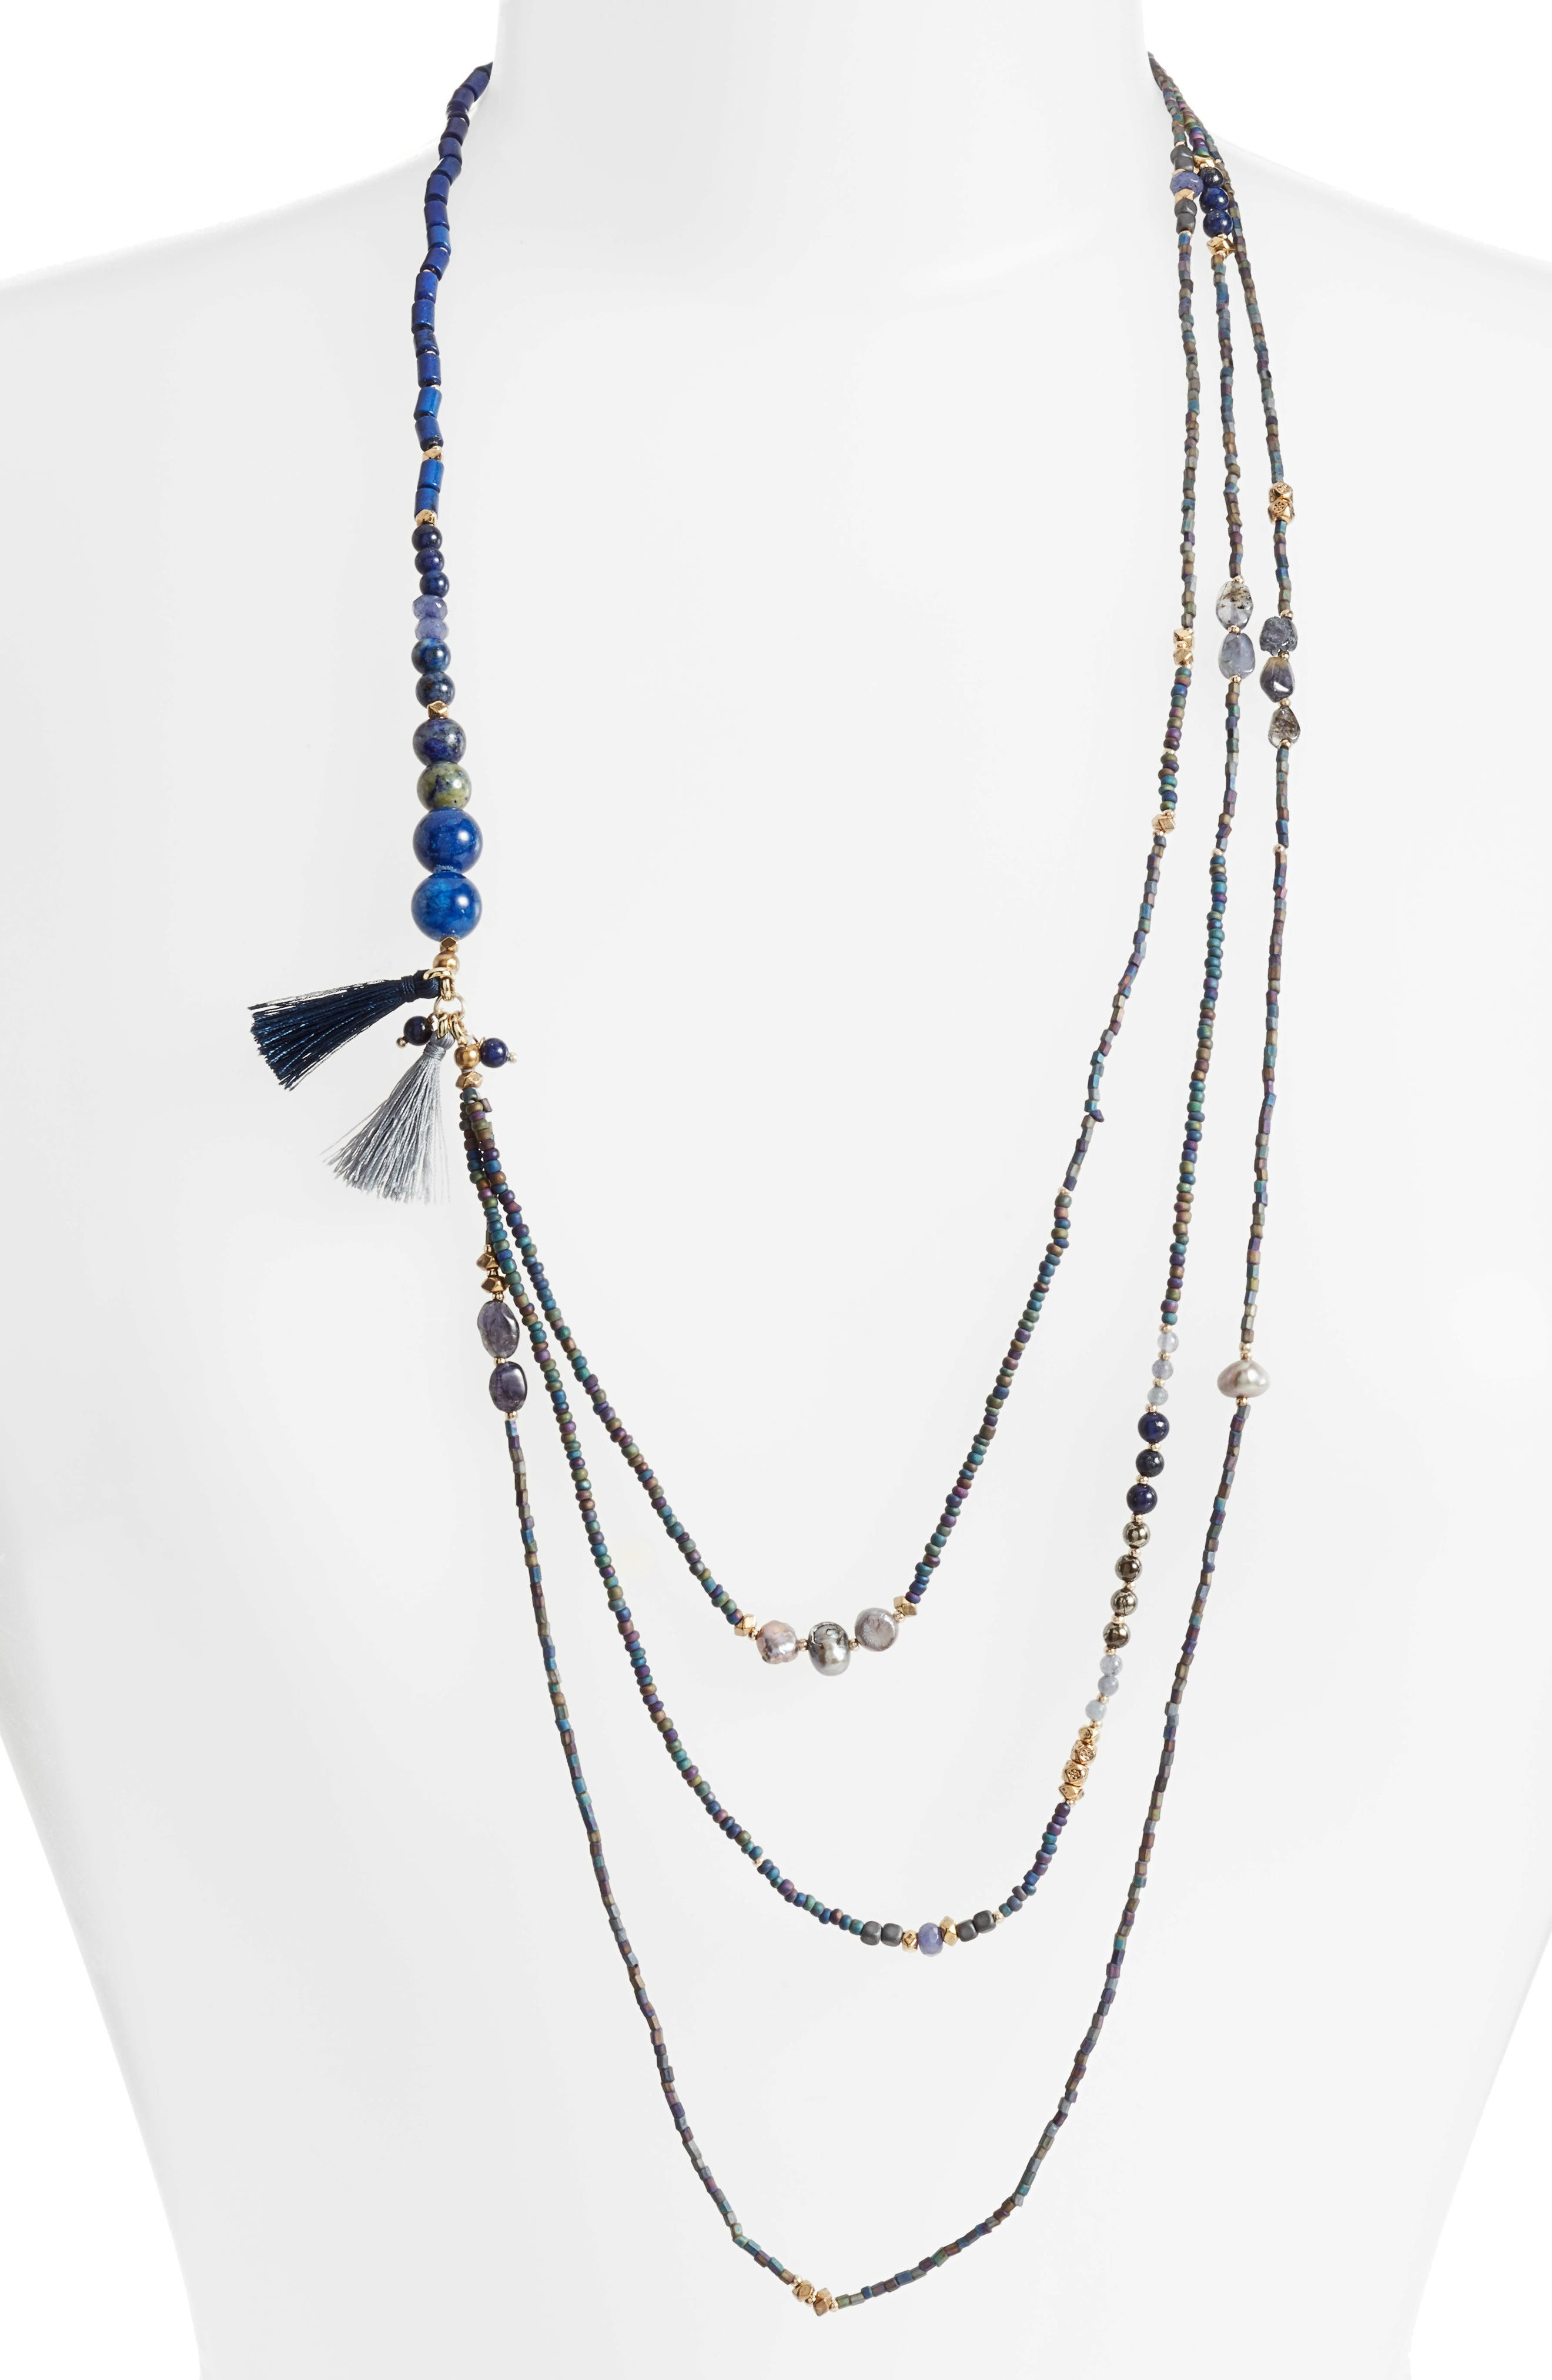 Konia Multistrand Tassel Necklace,                         Main,                         color, 400